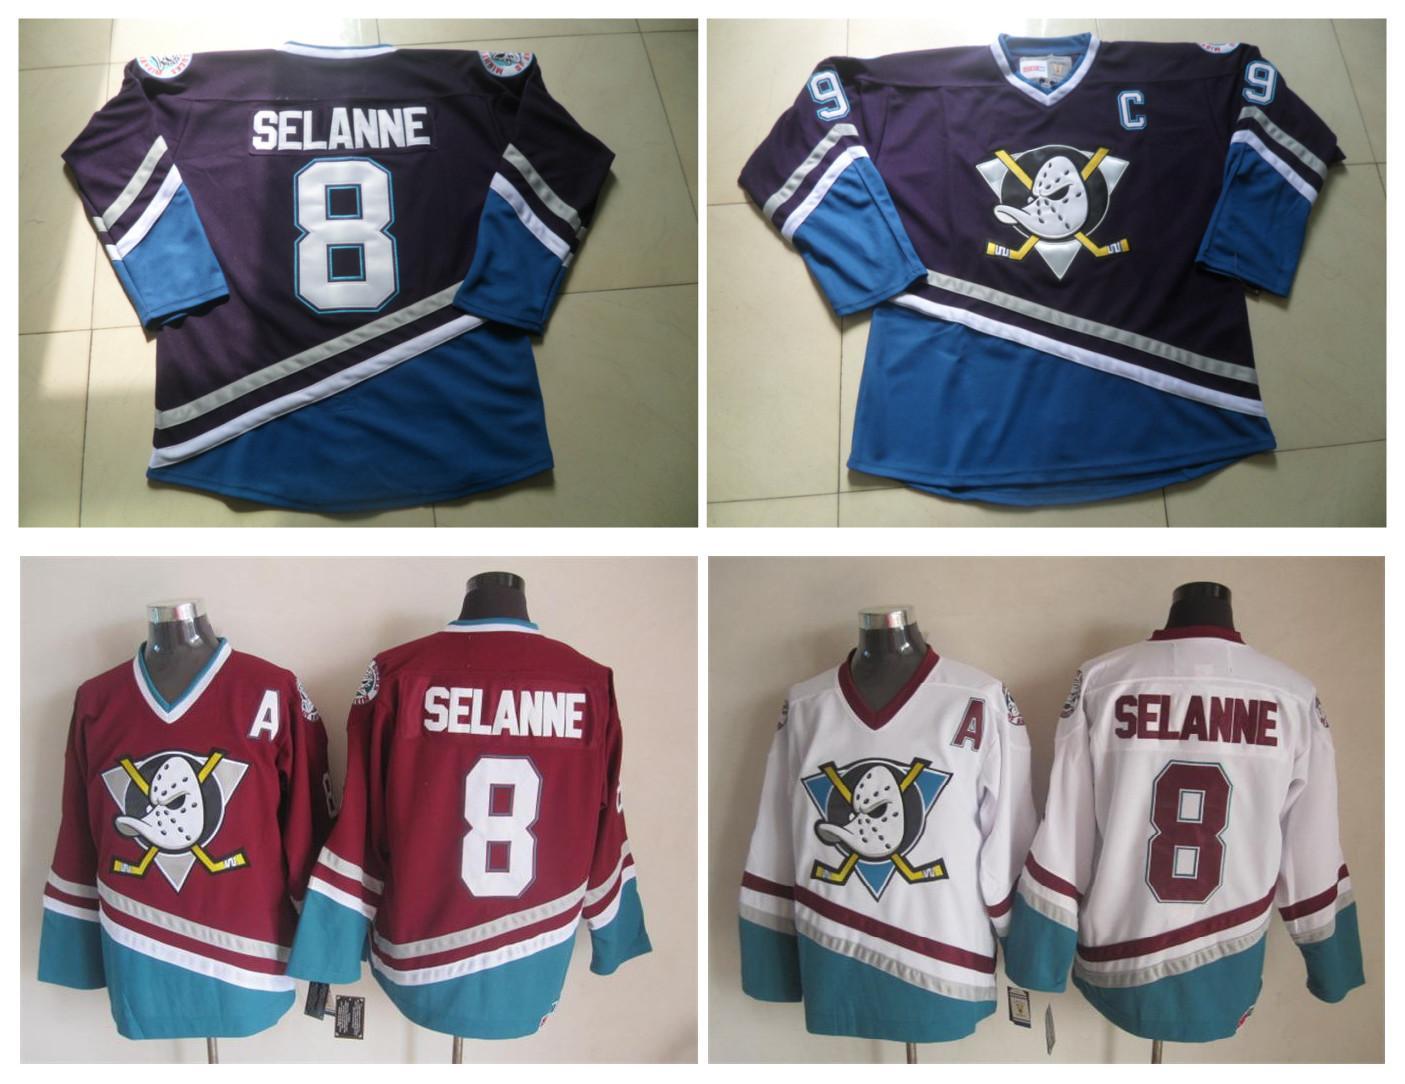 1f29a151e Wholesale Men s CCM Ice Hockey Jersey Cheap Mighty Ducks 8 Teemu ...